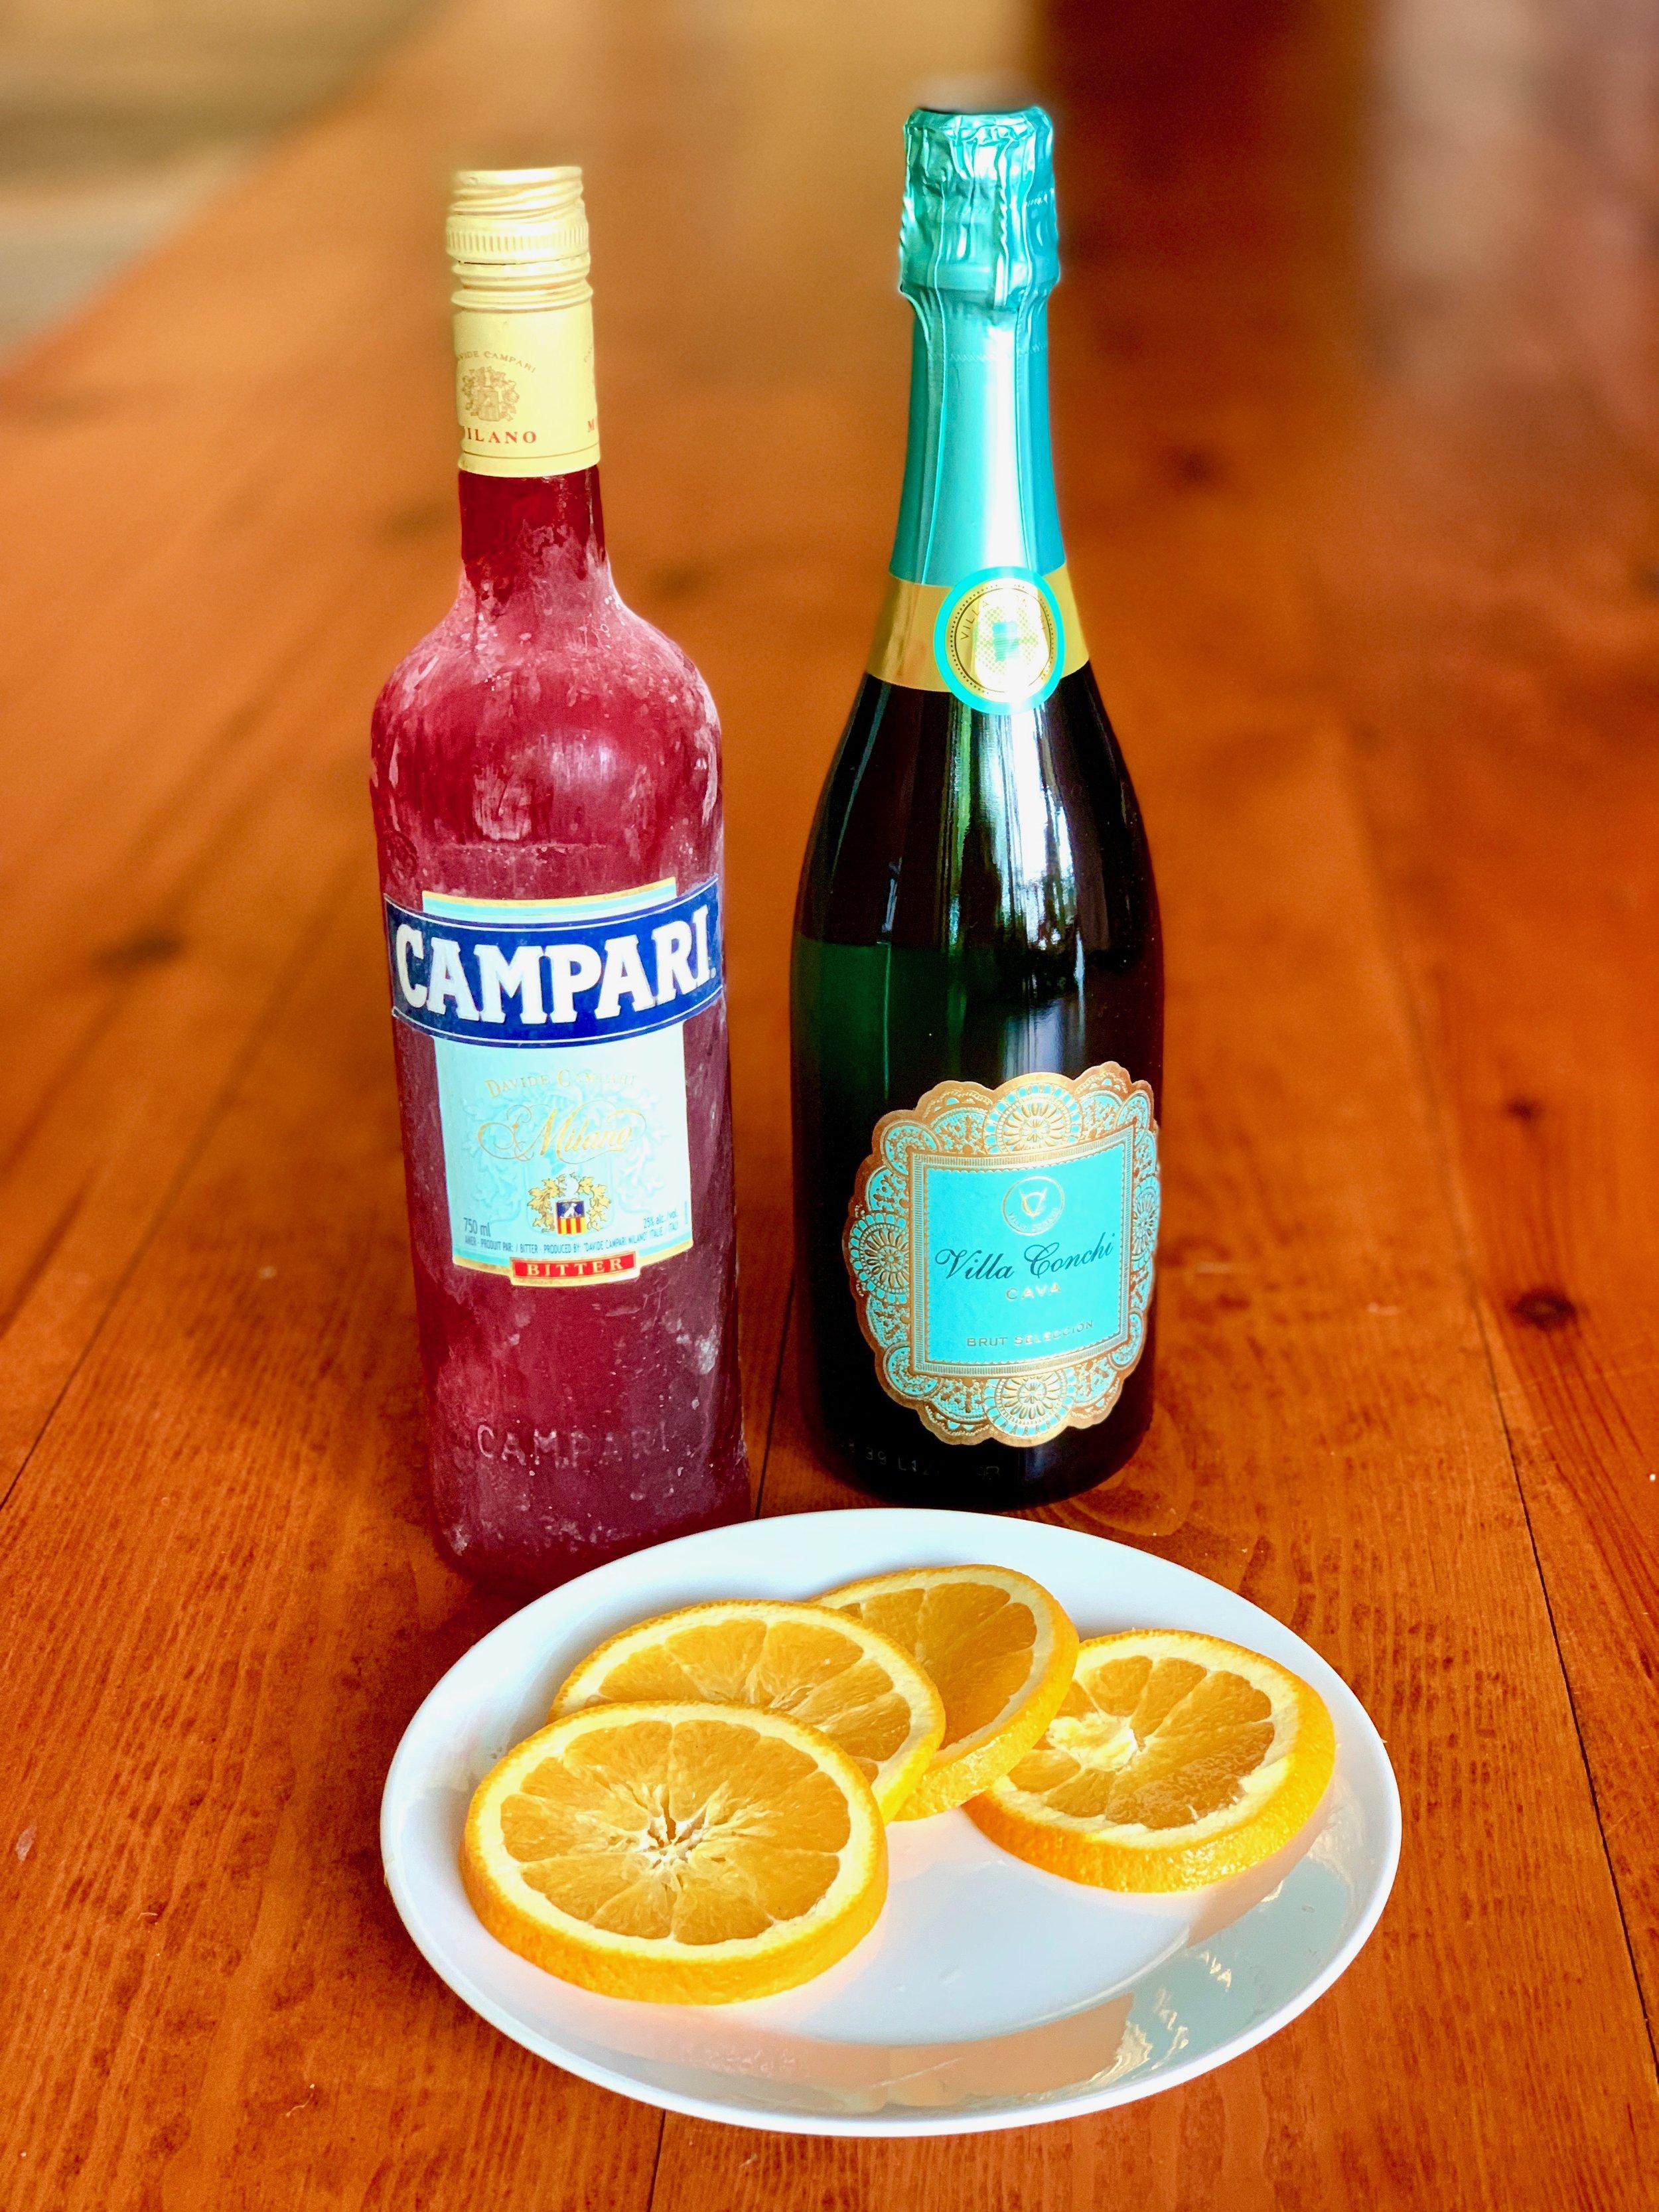 Simple ingredients for a Campari Spritz